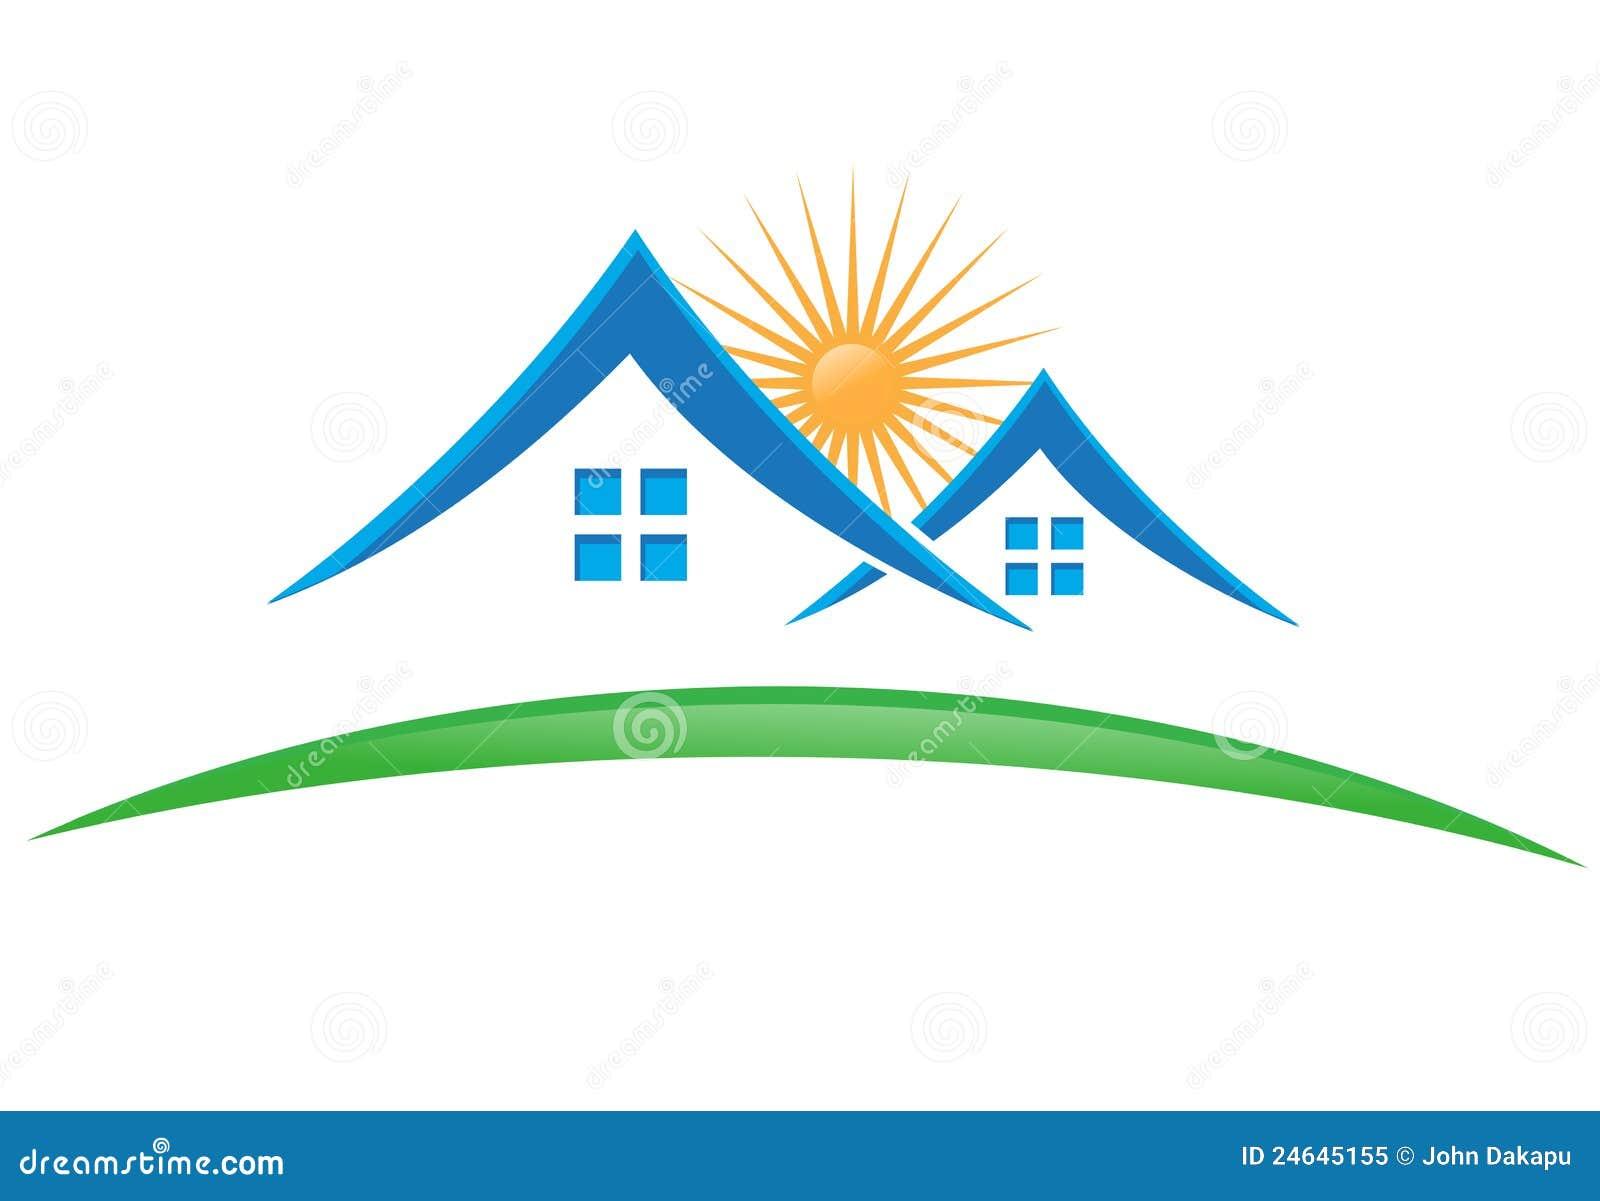 Top Logo Design realtor logo design : Real Estate Icon Royalty Free Stock Photo - Image: 24645155